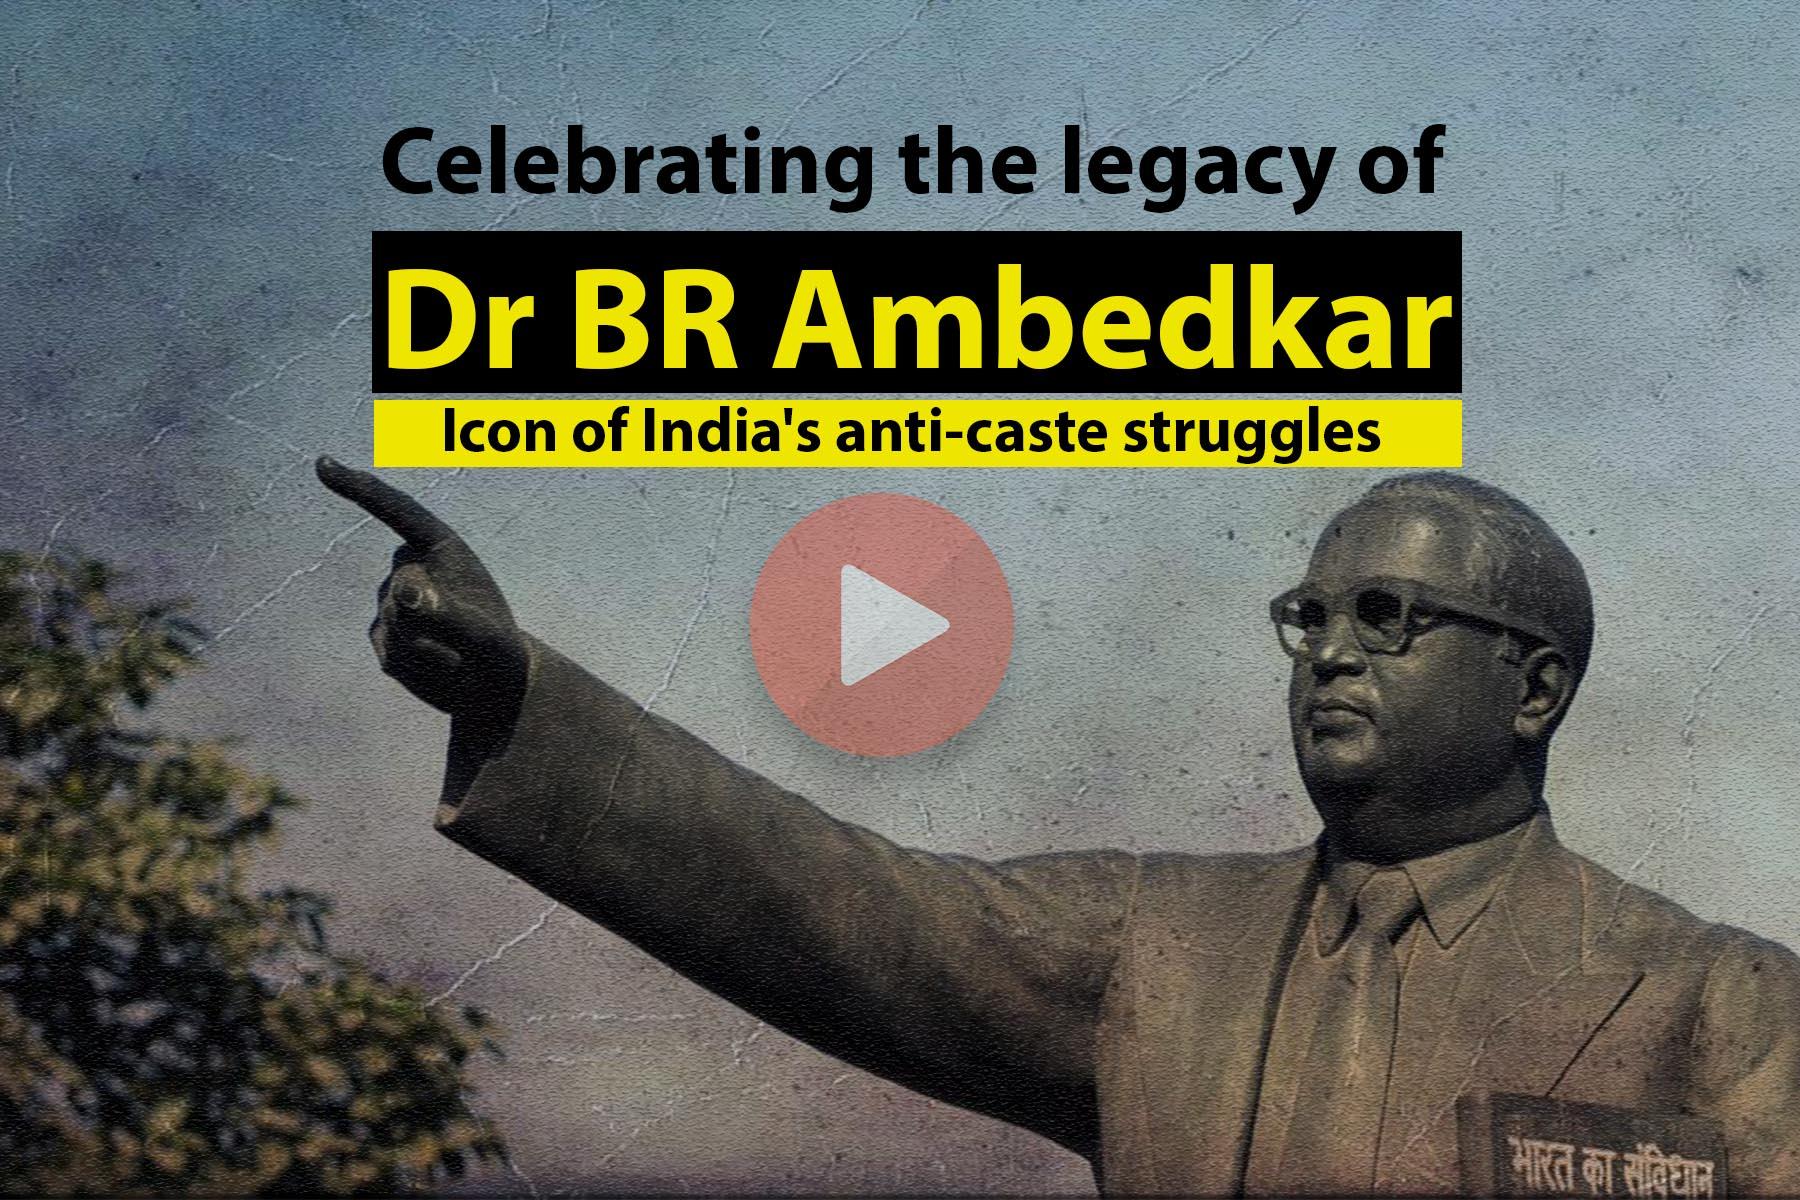 Ambedkar India